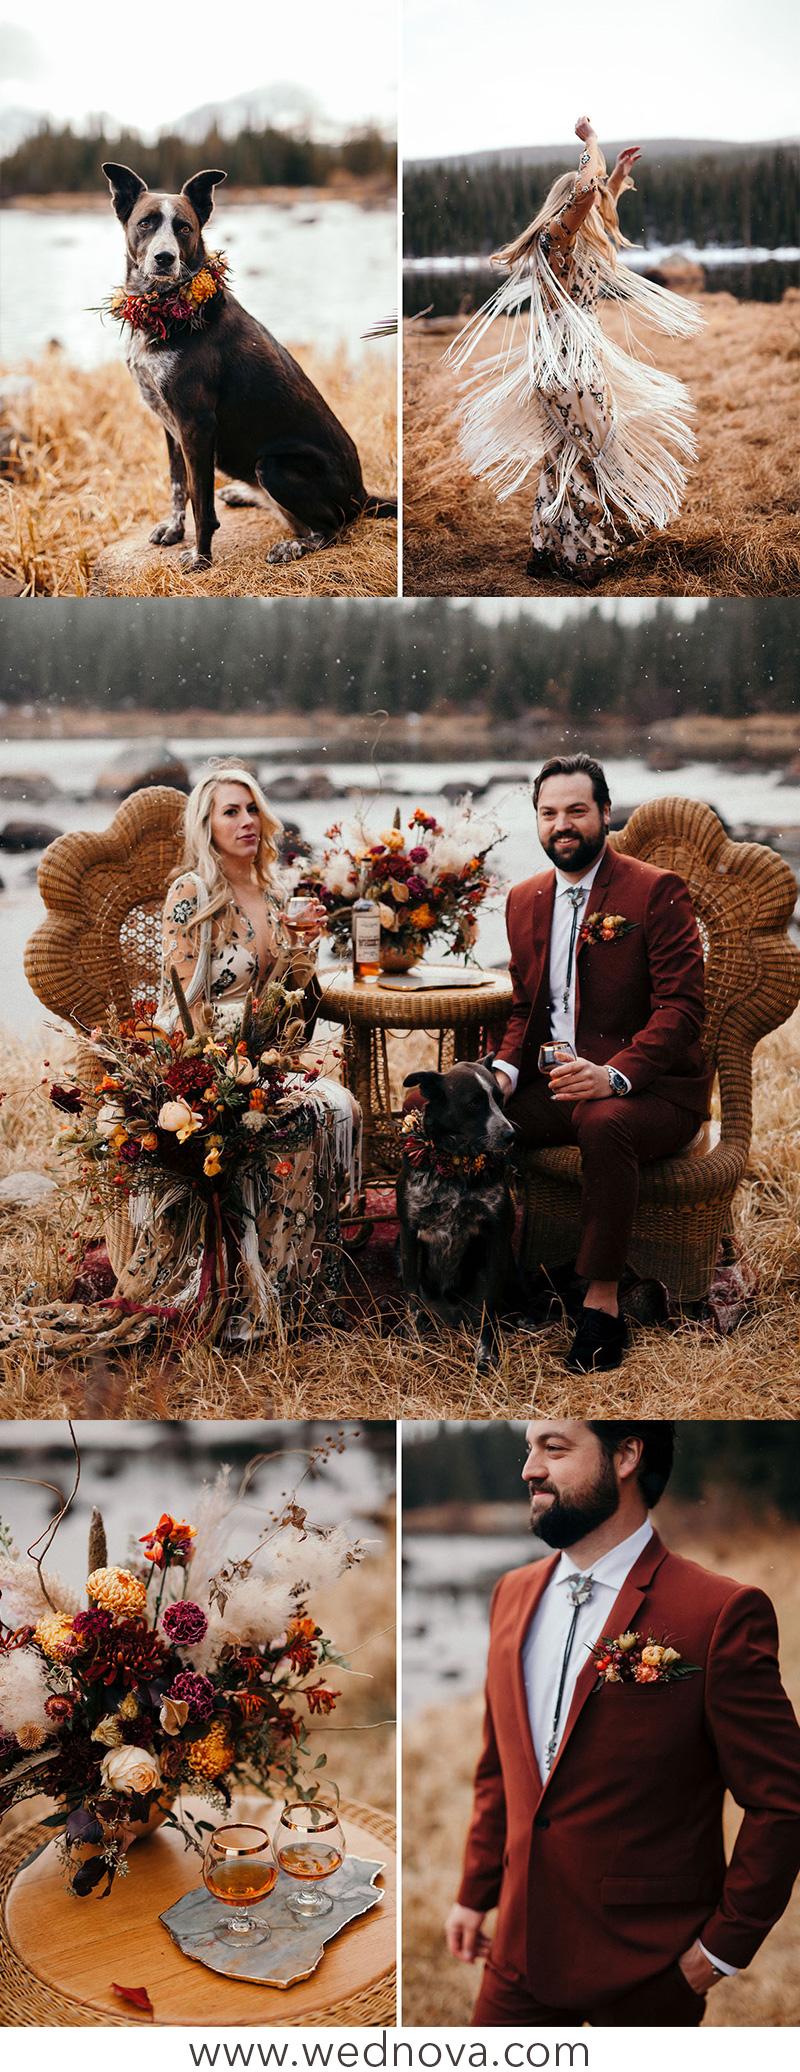 41a883512124 Top 15 Chic Boho Wedding Ideas Inspired Your Wedding - WedNova Blog